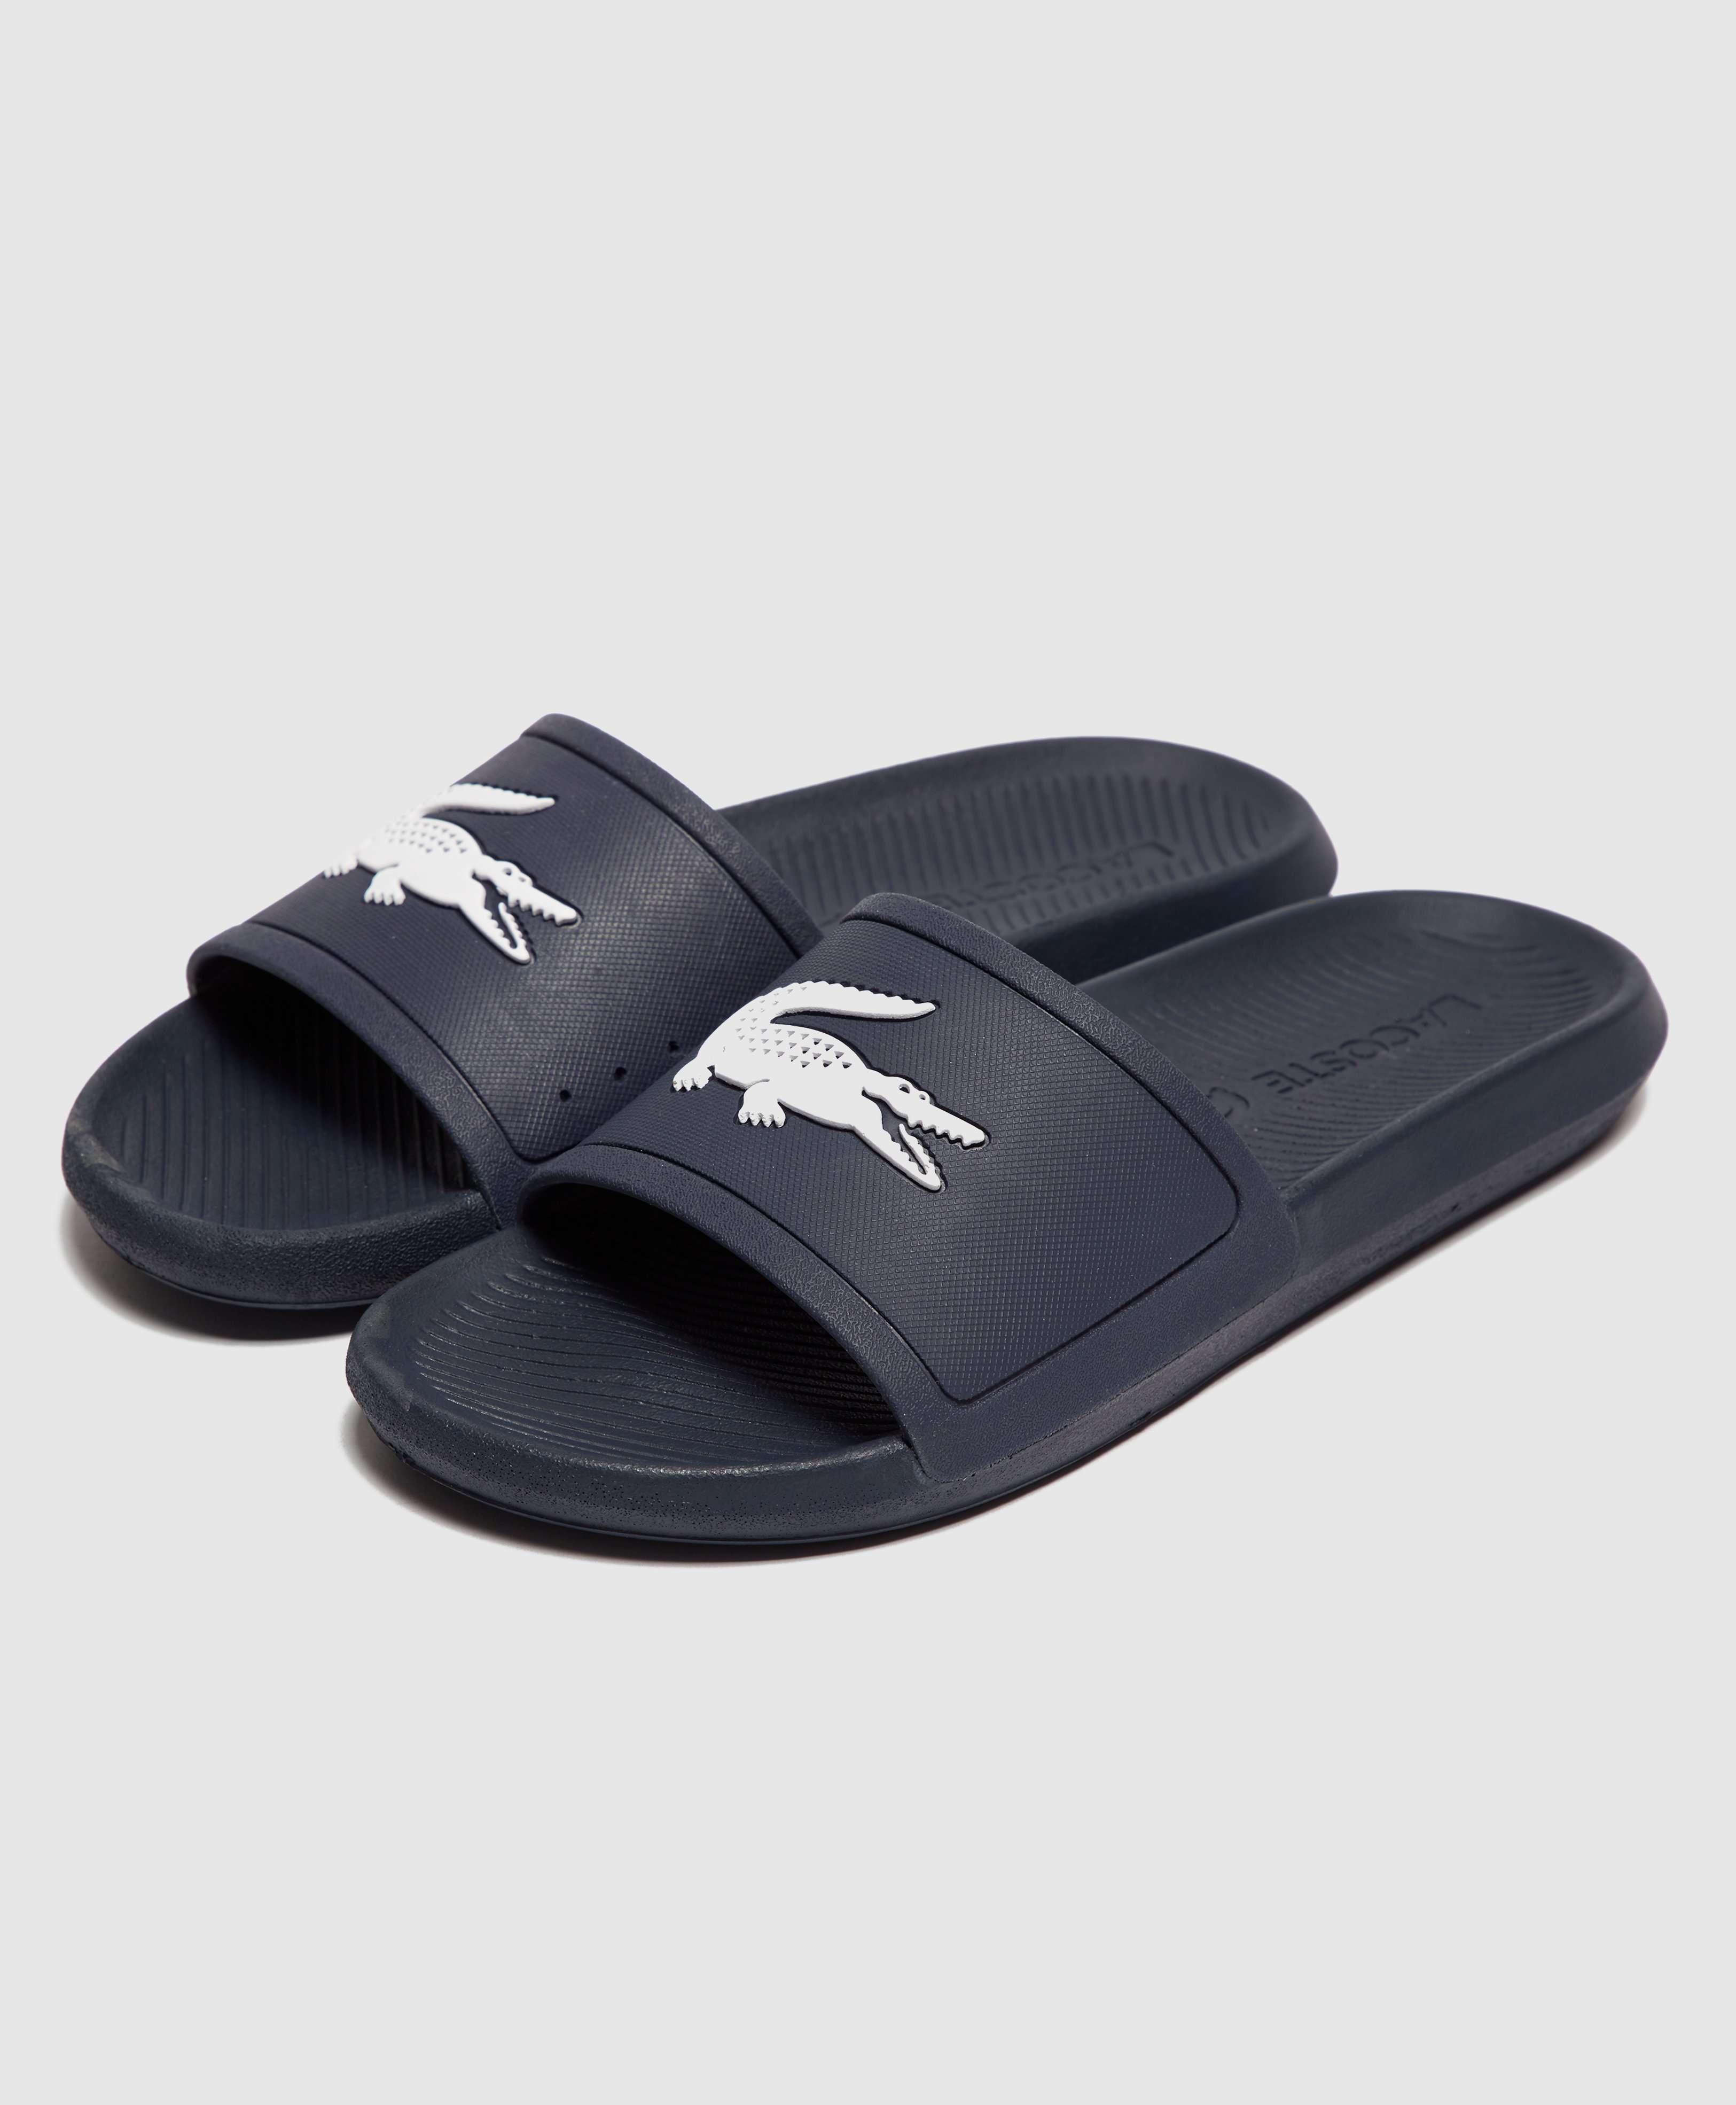 Lacoste Croco Slides